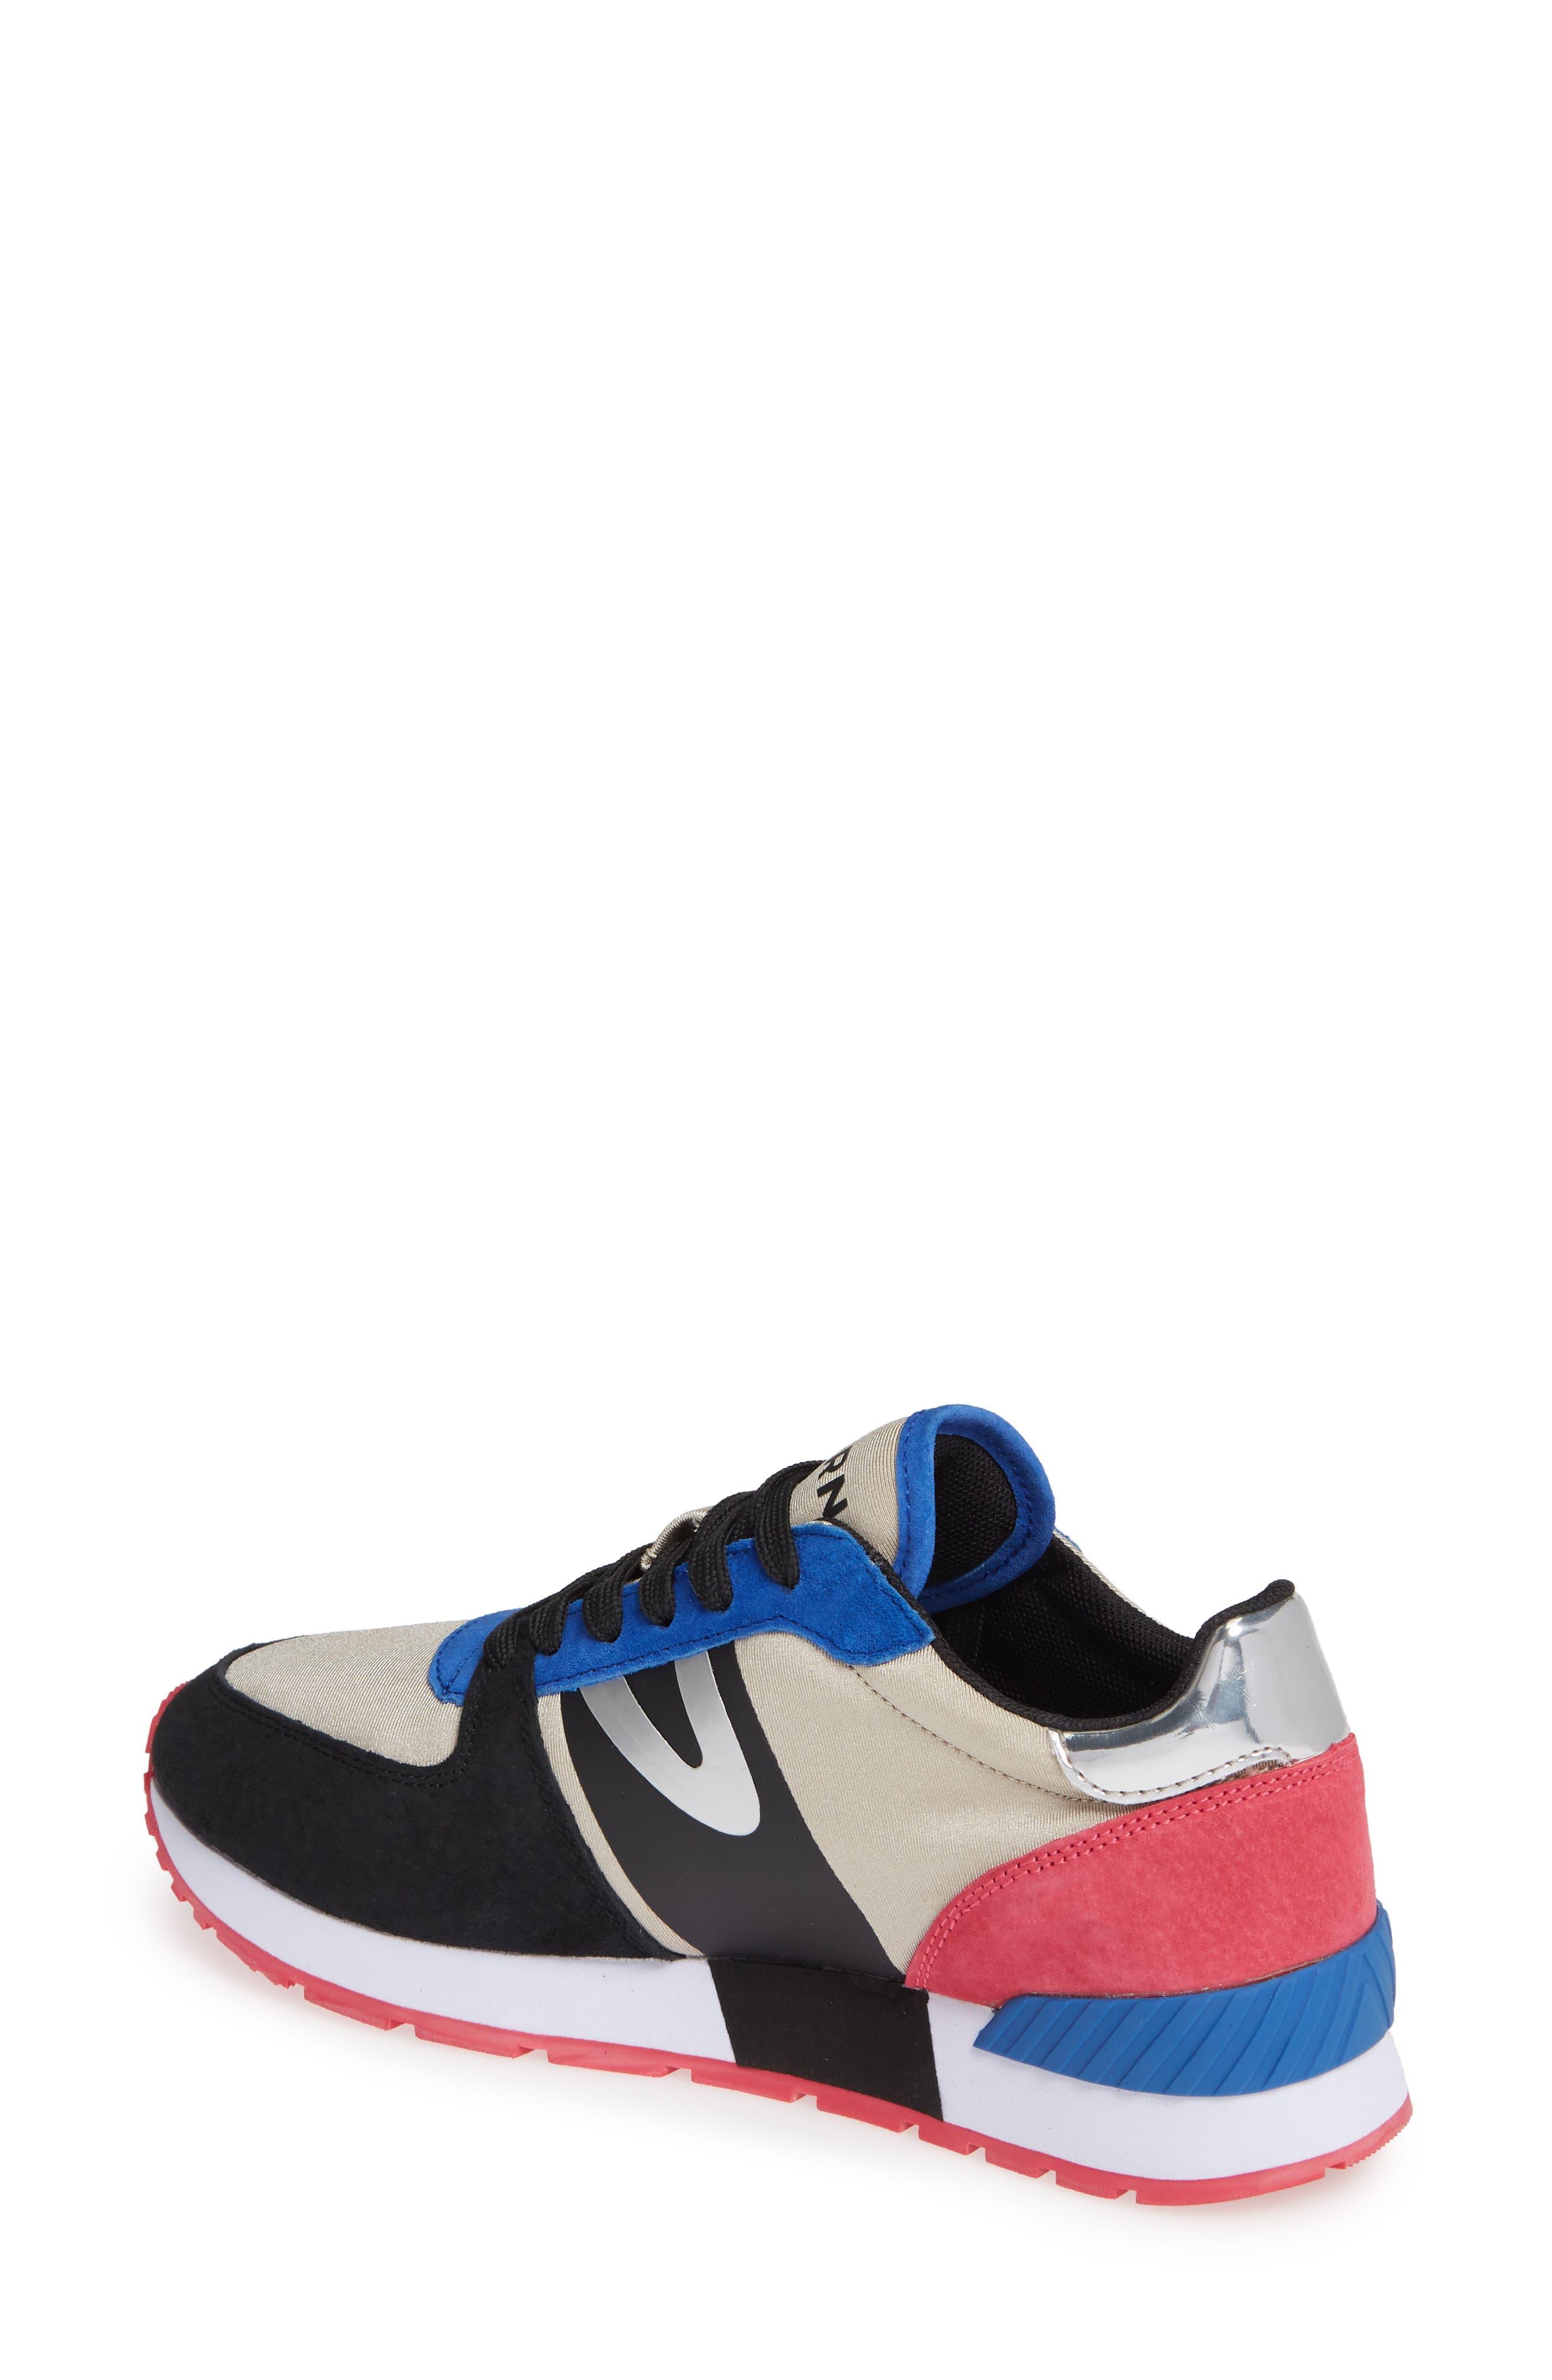 TRETORN,                             Loyola3 Sneaker,                             Alternate thumbnail 2, color,                             GLACIER GREY/ MARSHMALLOW